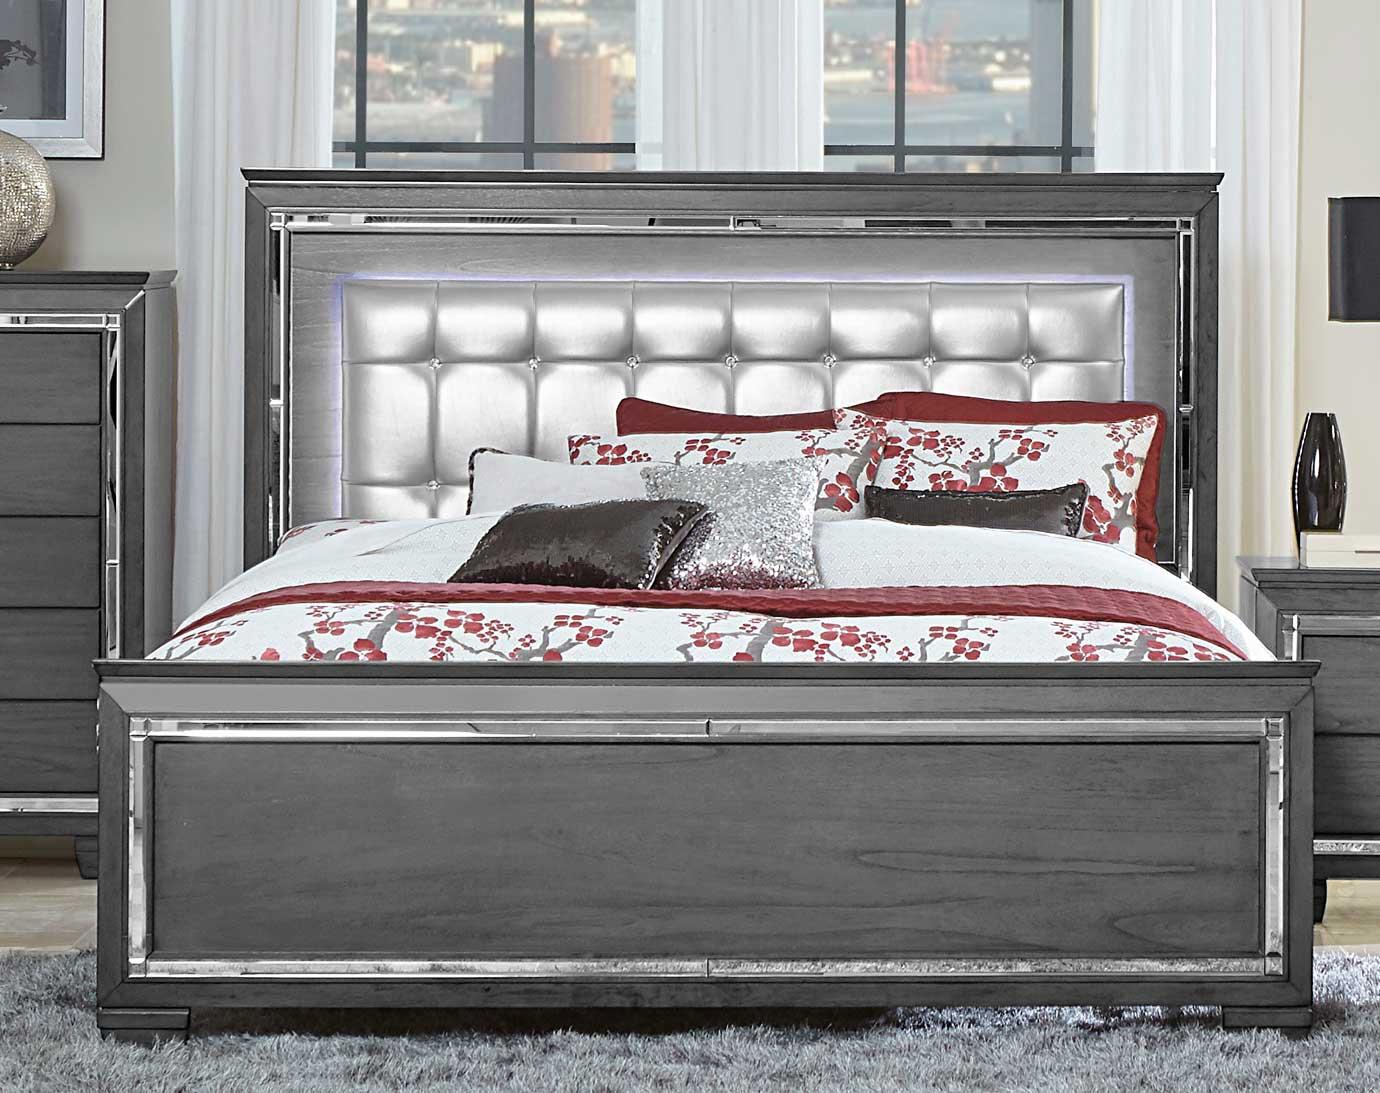 Homelegance Allura Bed with LED Lighting - Gray